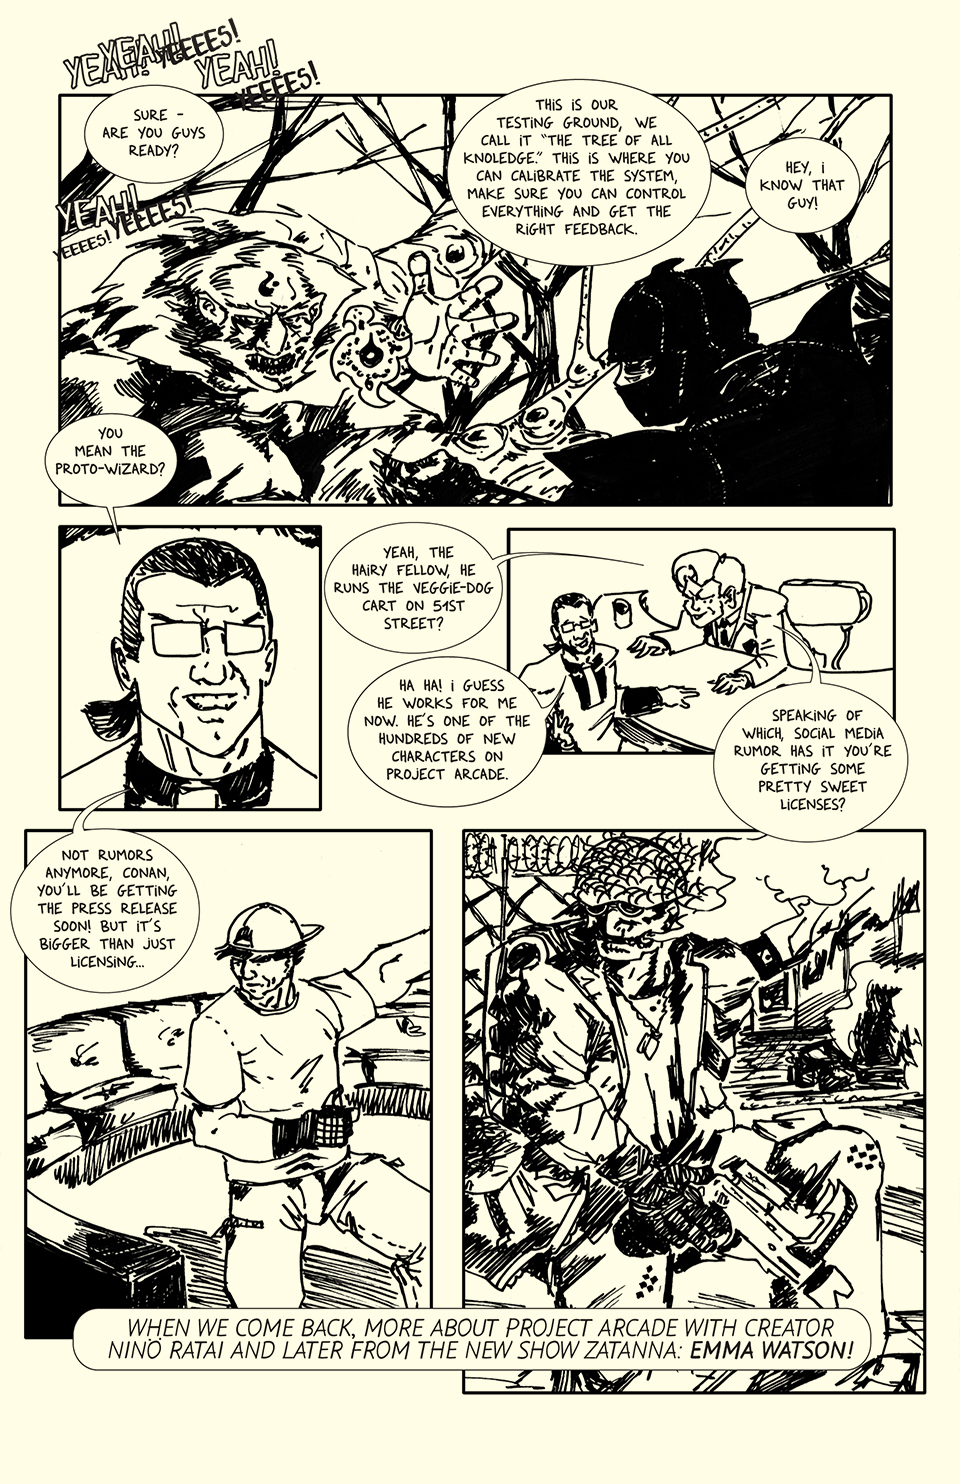 Page 3 art by Roho